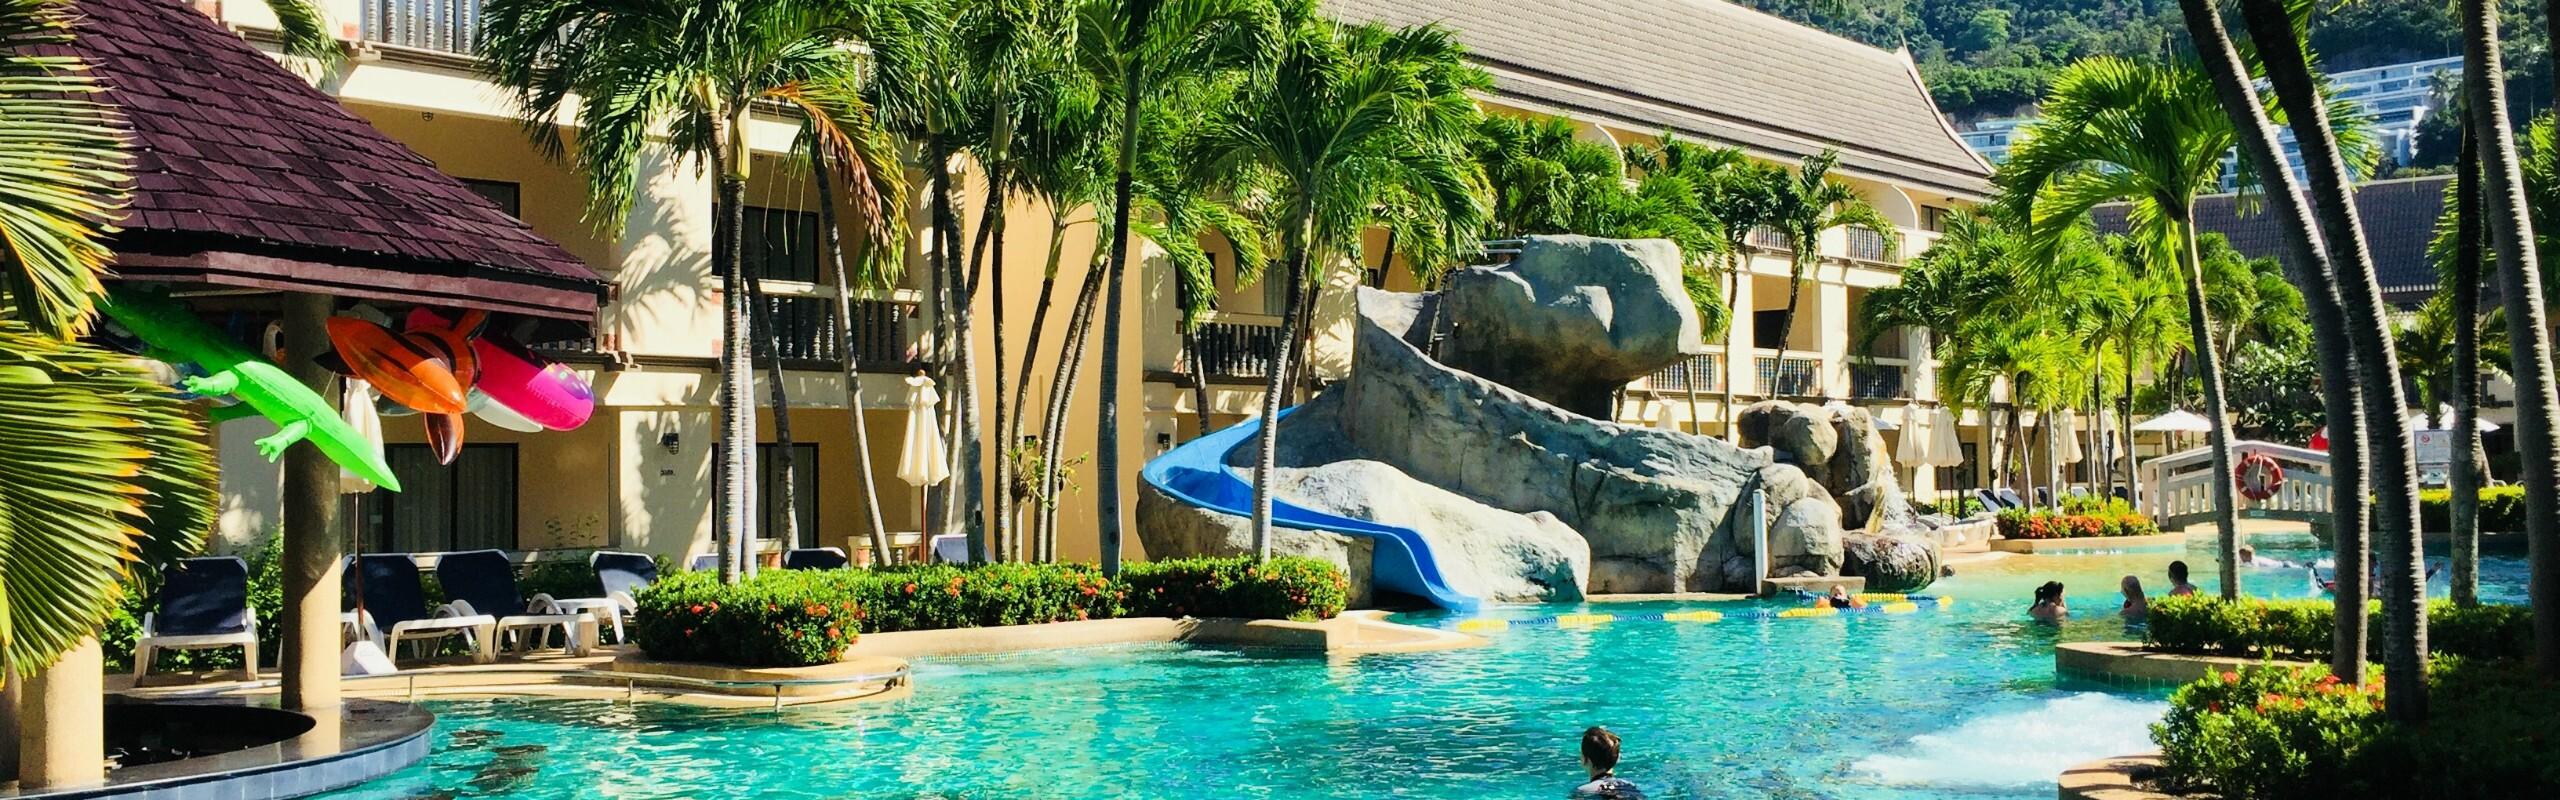 Choosing a Hotel in Krabi